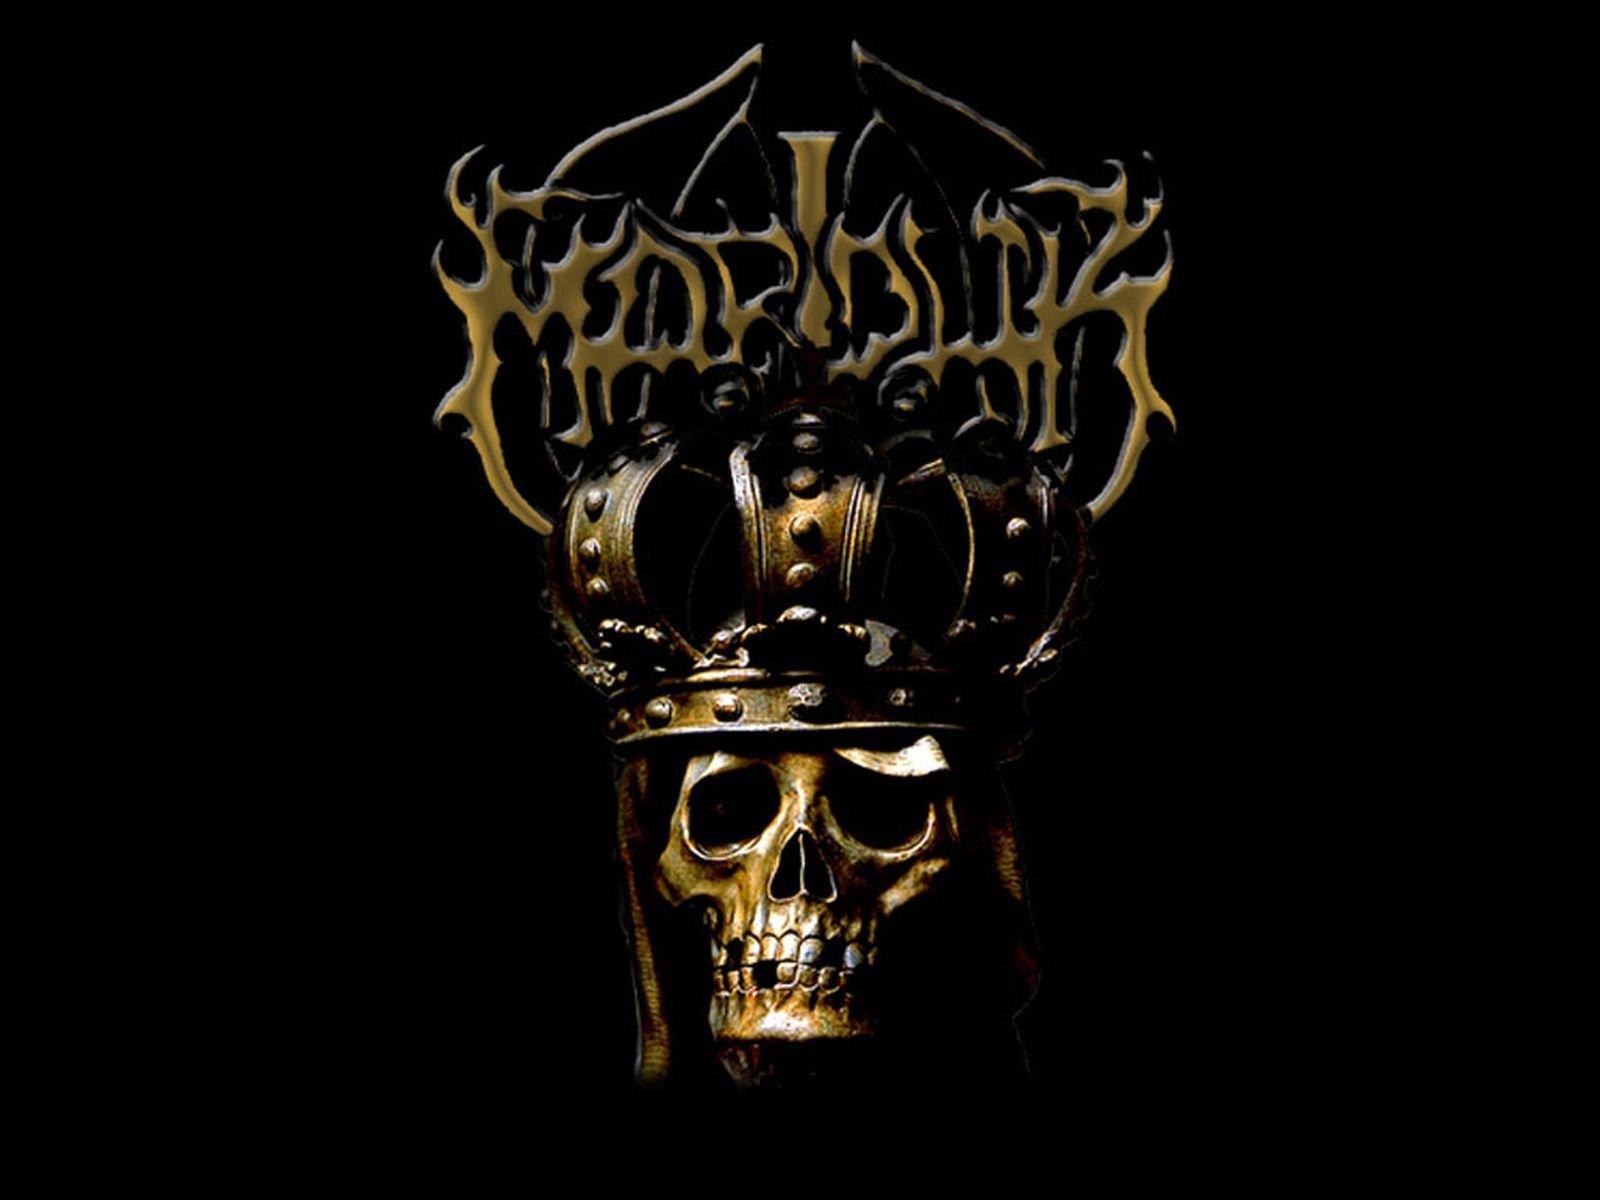 hard rock bands skull - photo #6